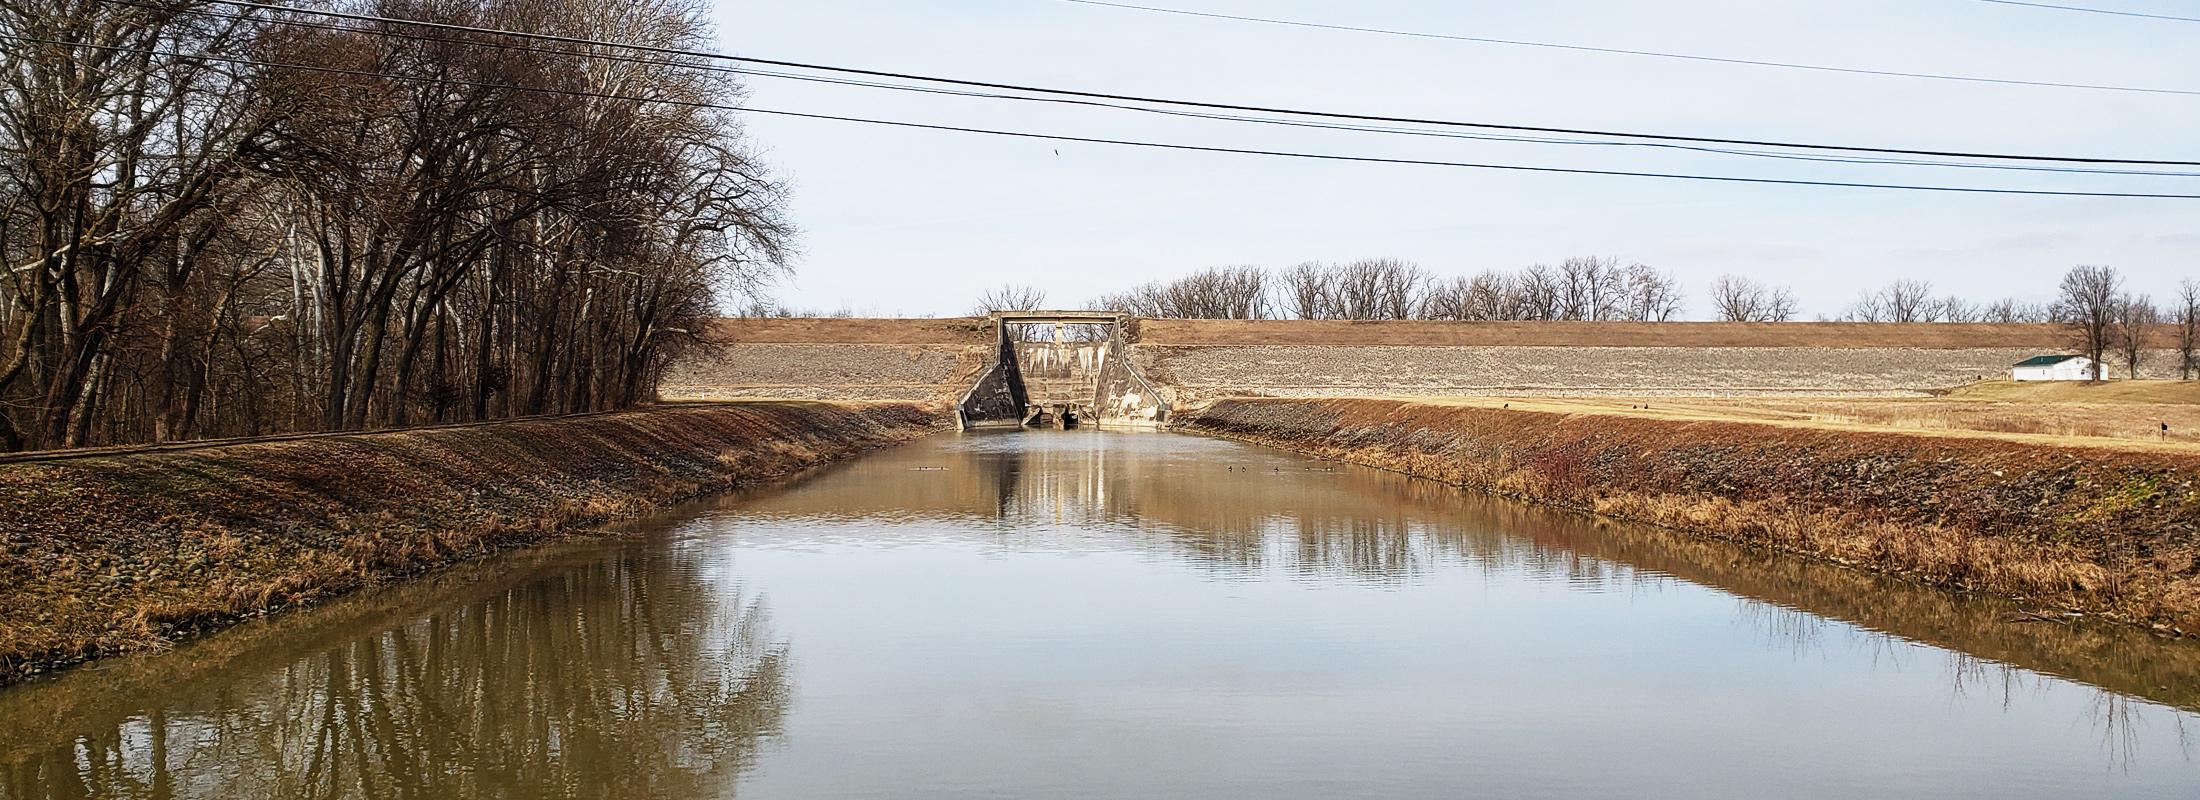 Village of Lockington Ohio